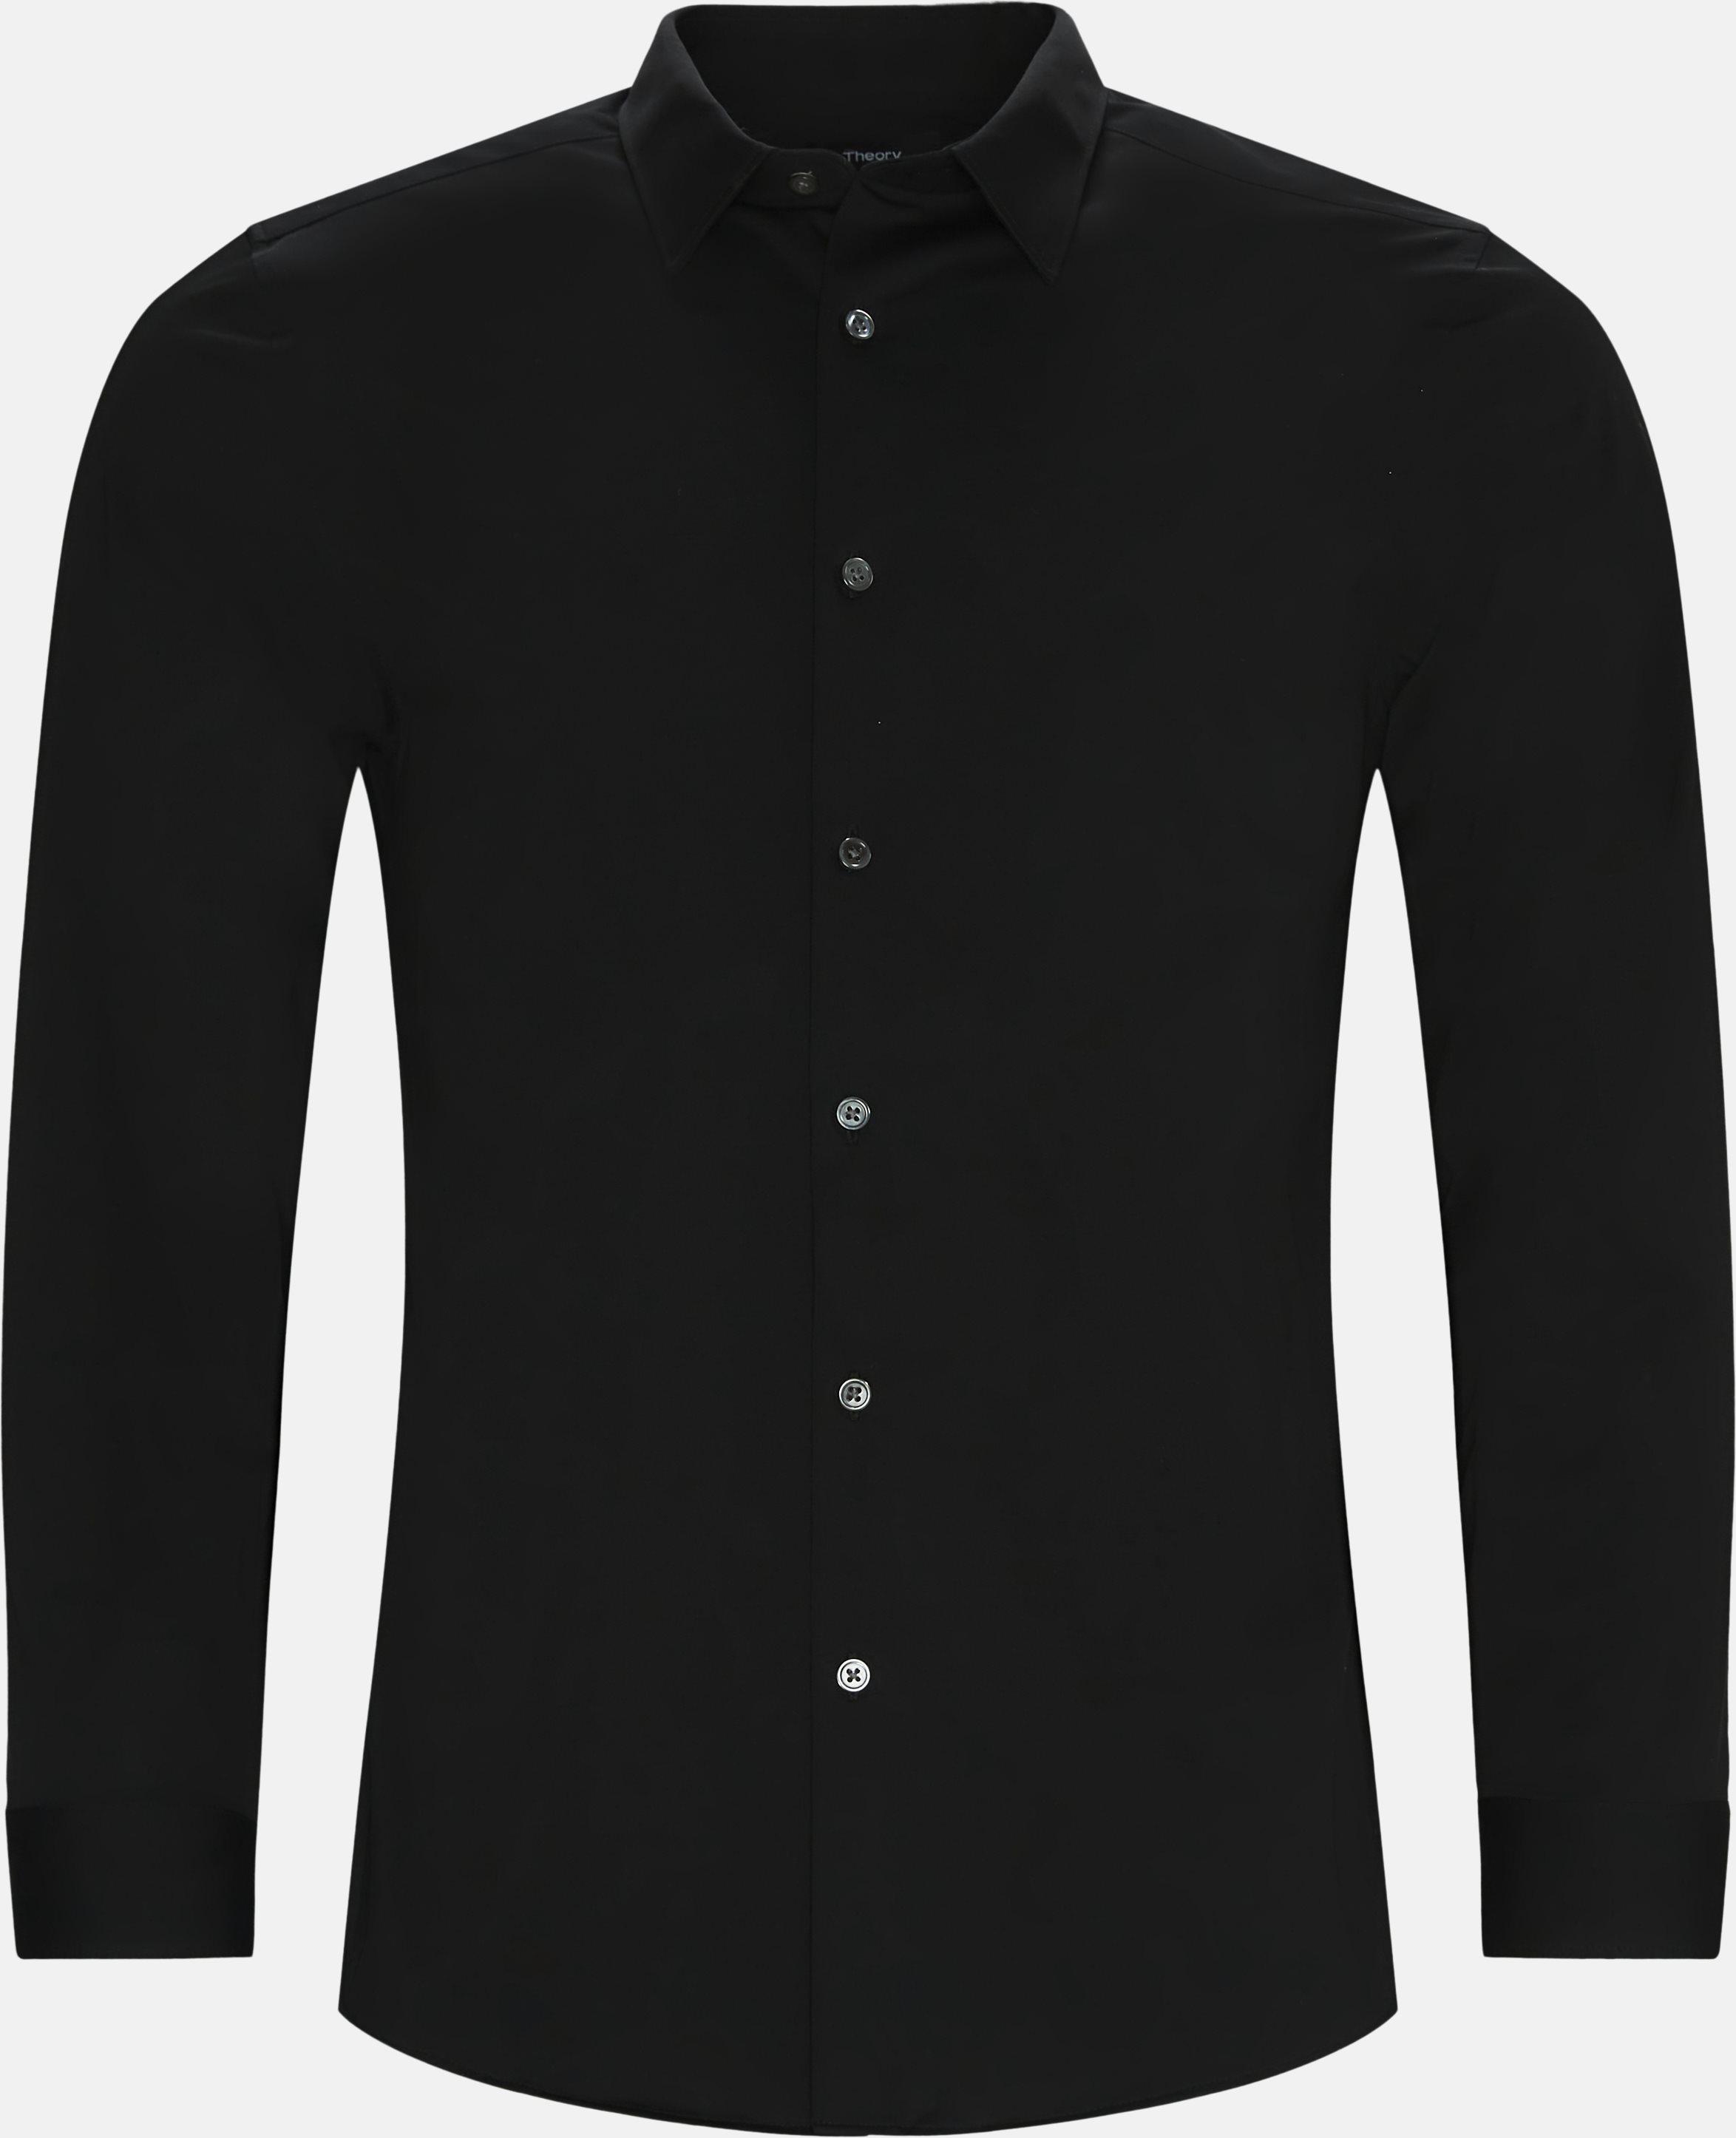 Skjorter - Regular fit - Sort